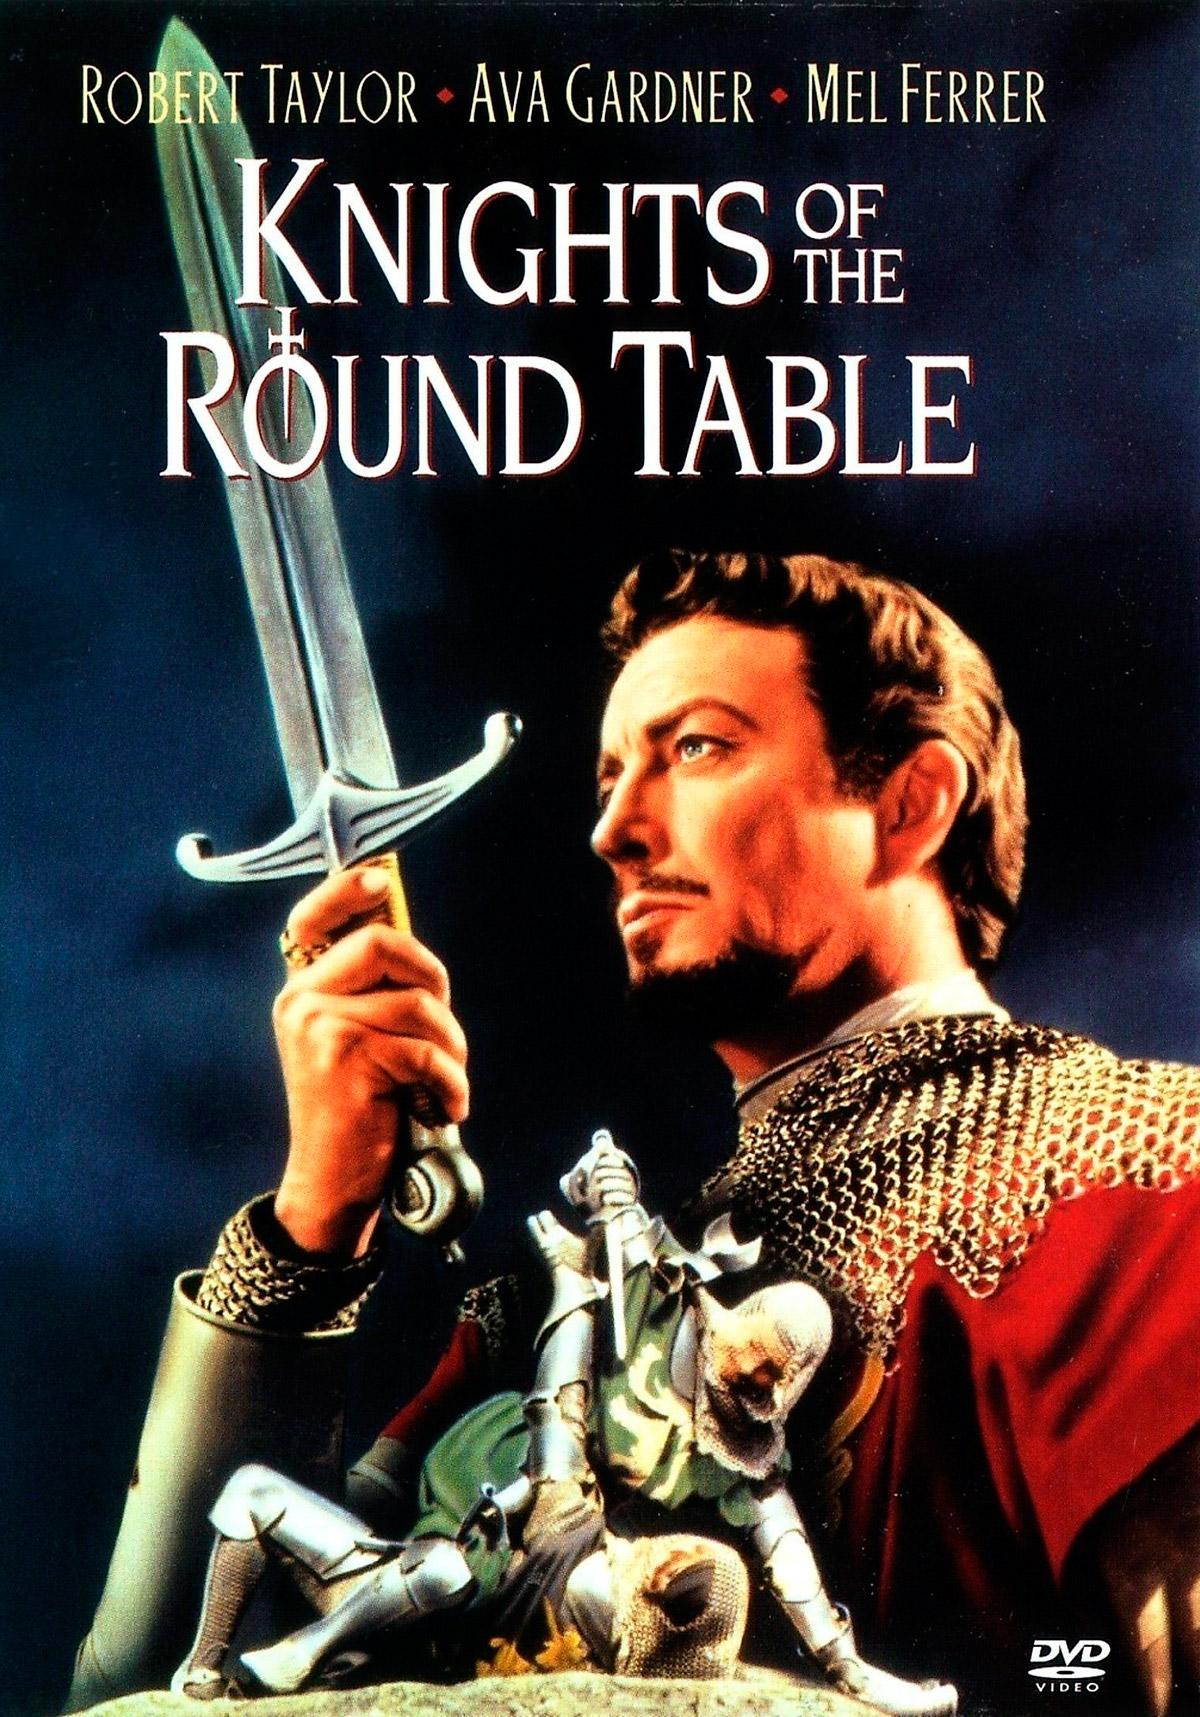 Photo de robert taylor les chevaliers de la table ronde - Film les chevaliers de la table ronde ...